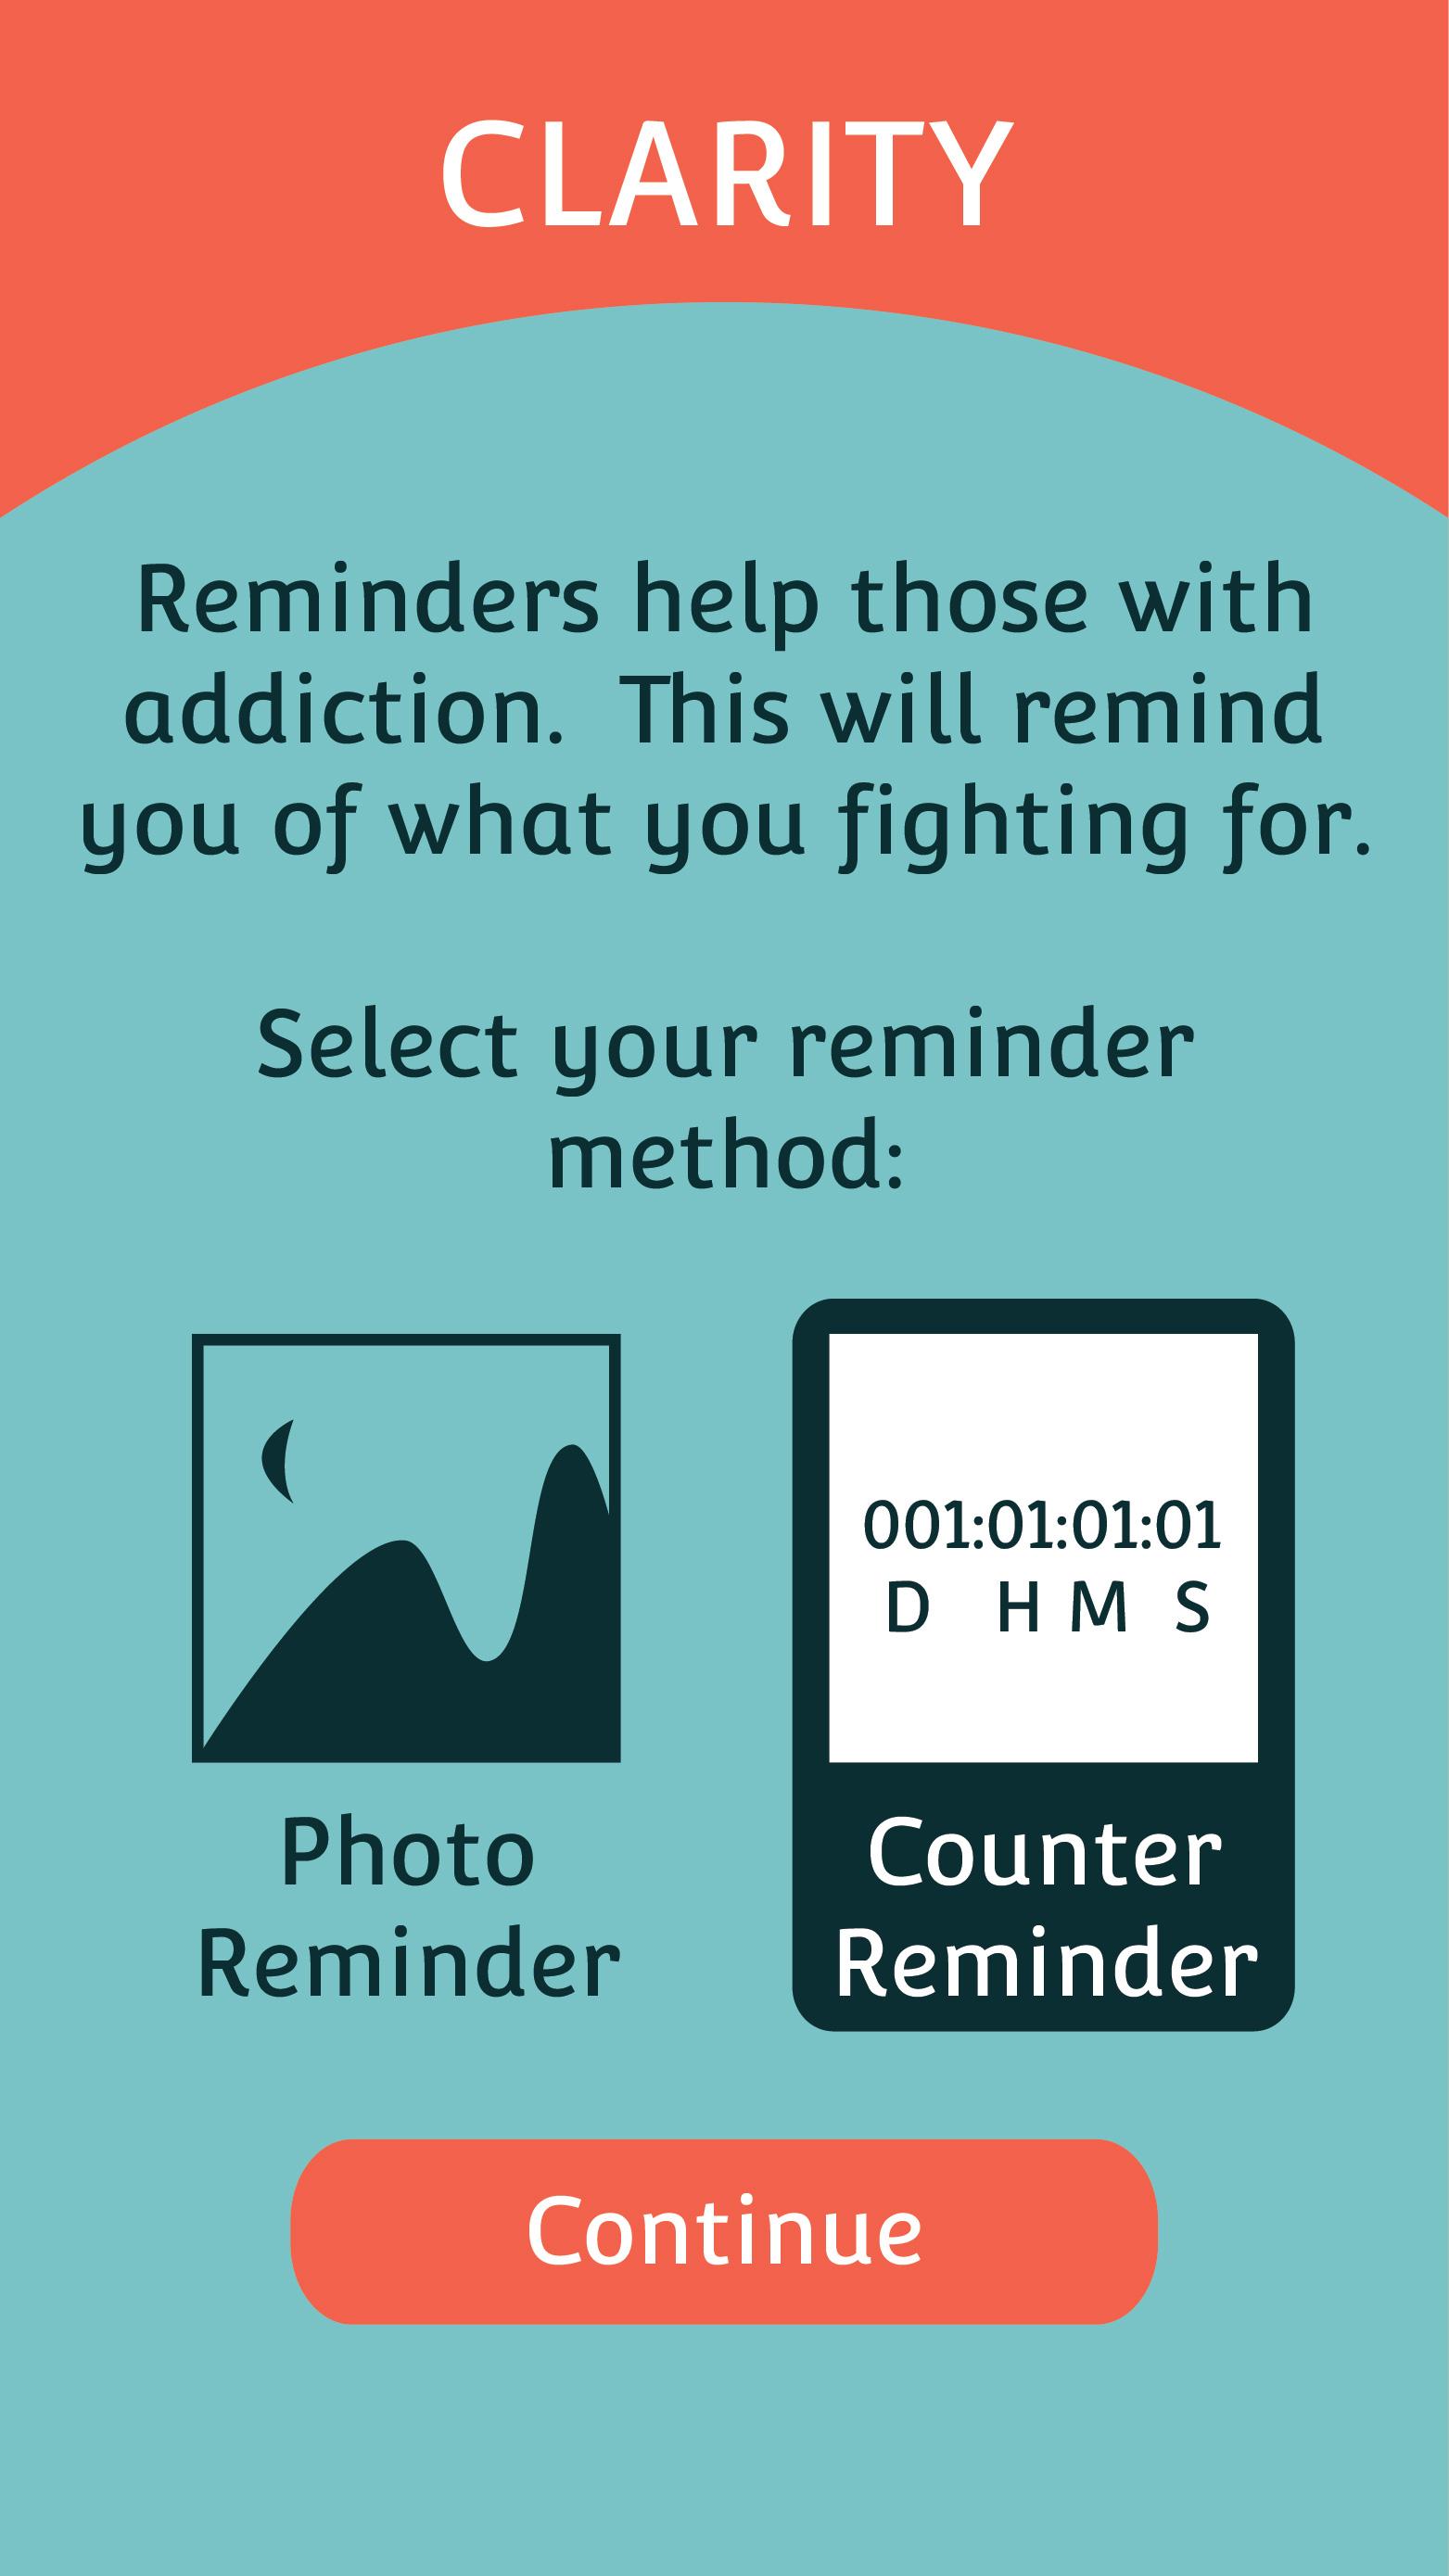 Reminder Selector